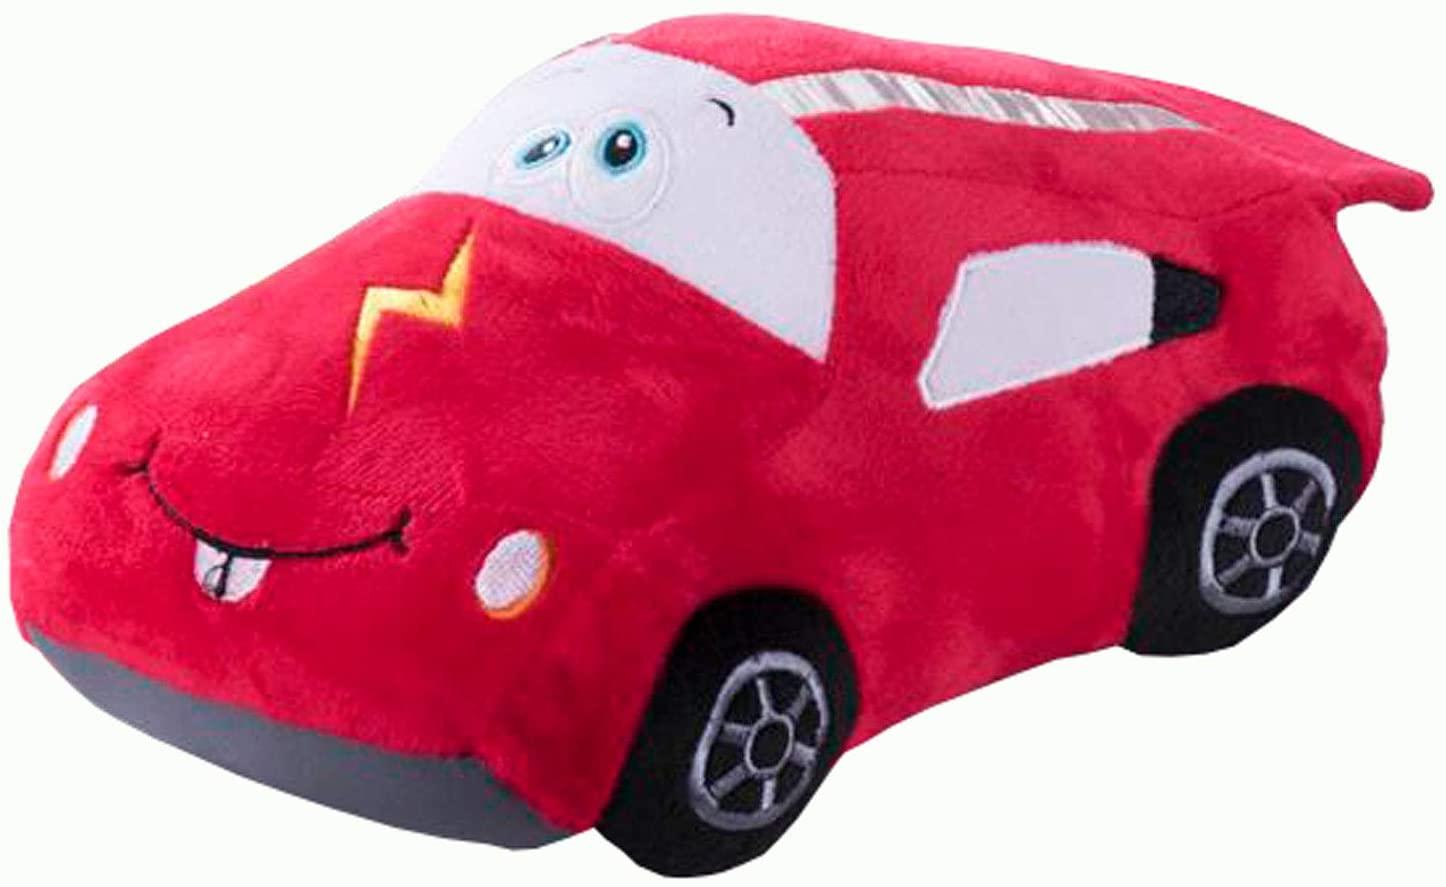 Plush Animal Car Speedy 26cm for Selberstopfen